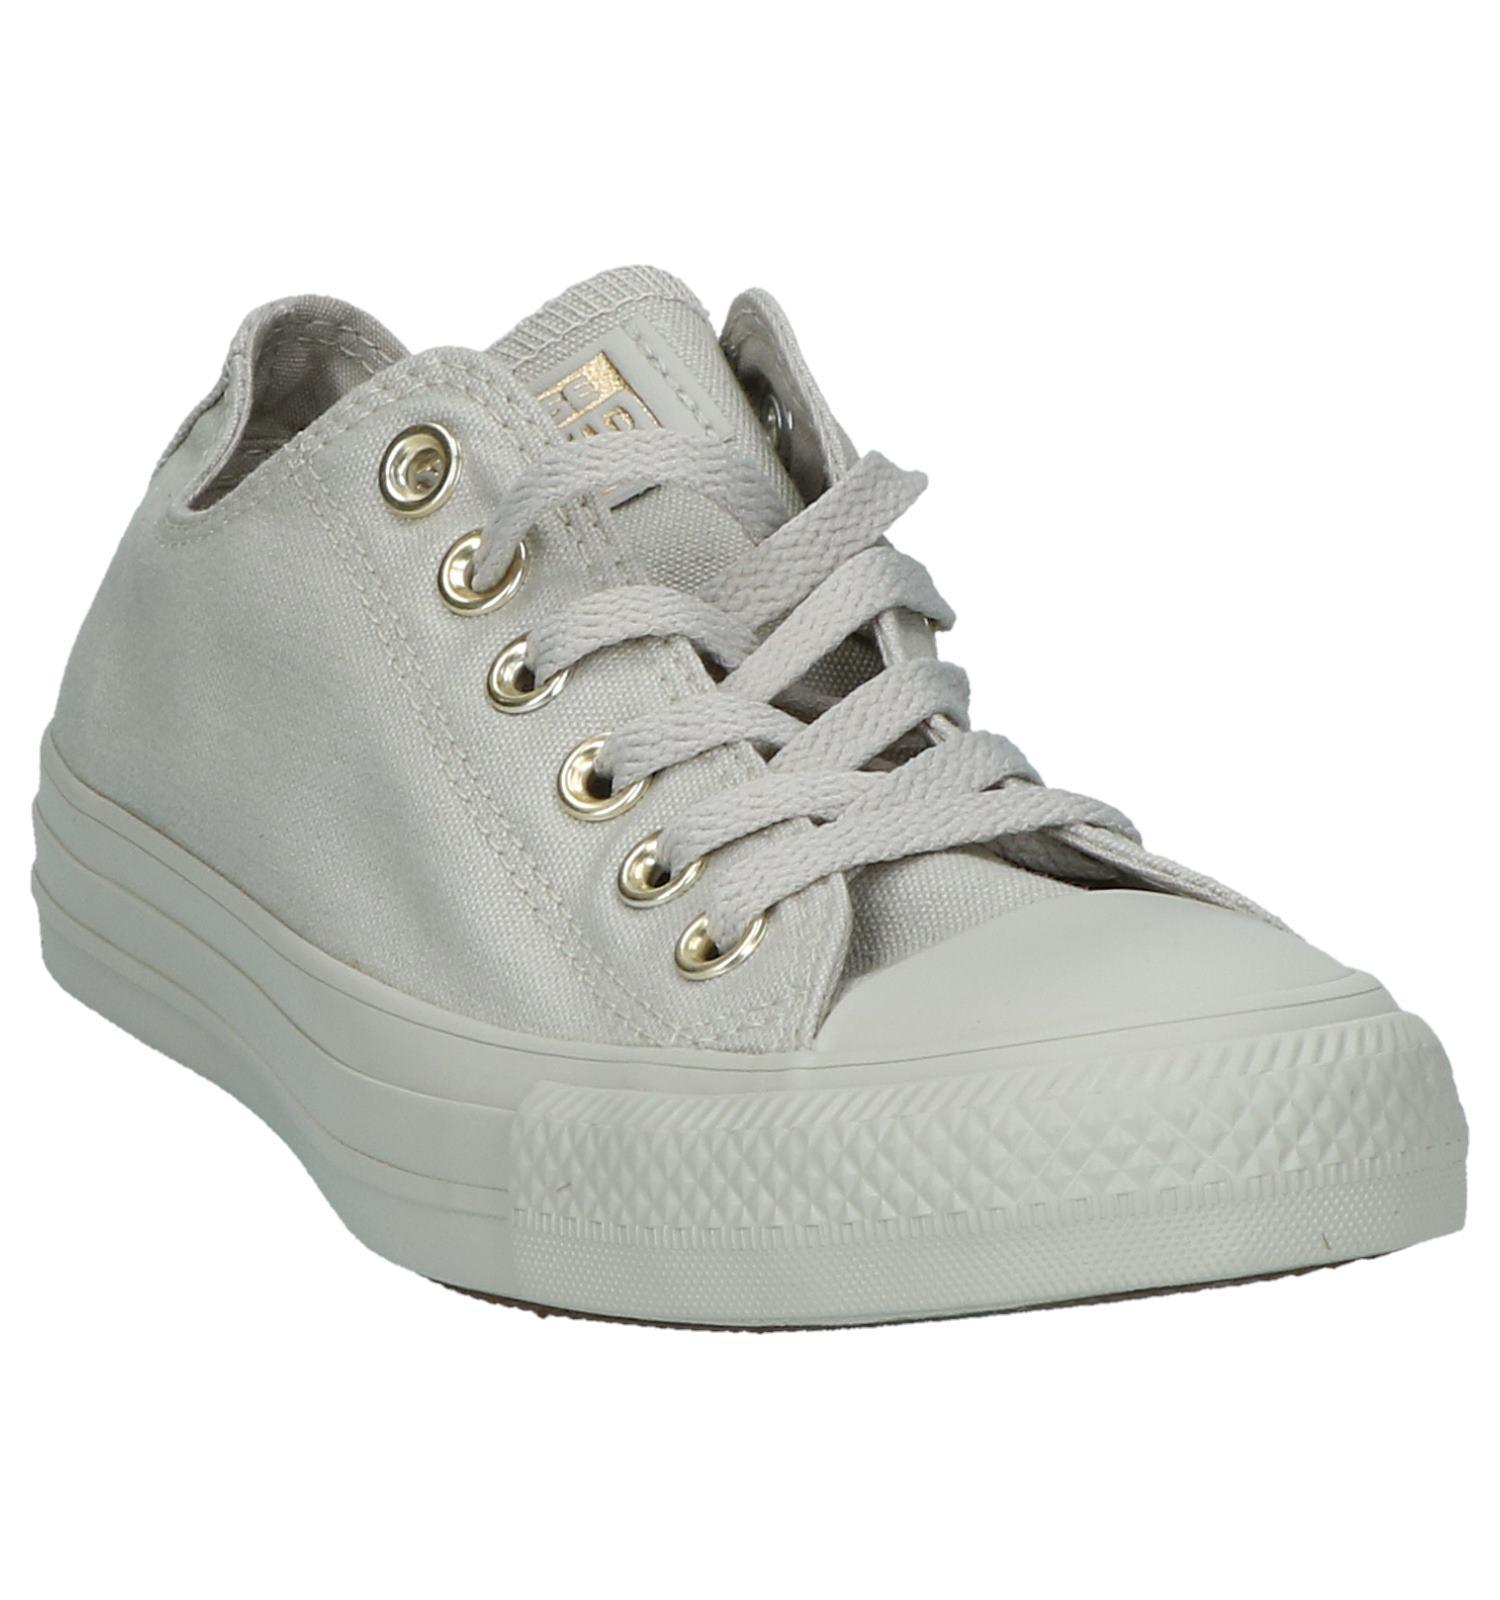 e0545c1c745 Lichtgrijze Converse Chuck Taylor All Star OX Sneakers | TORFS.BE | Gratis  verzend en retour